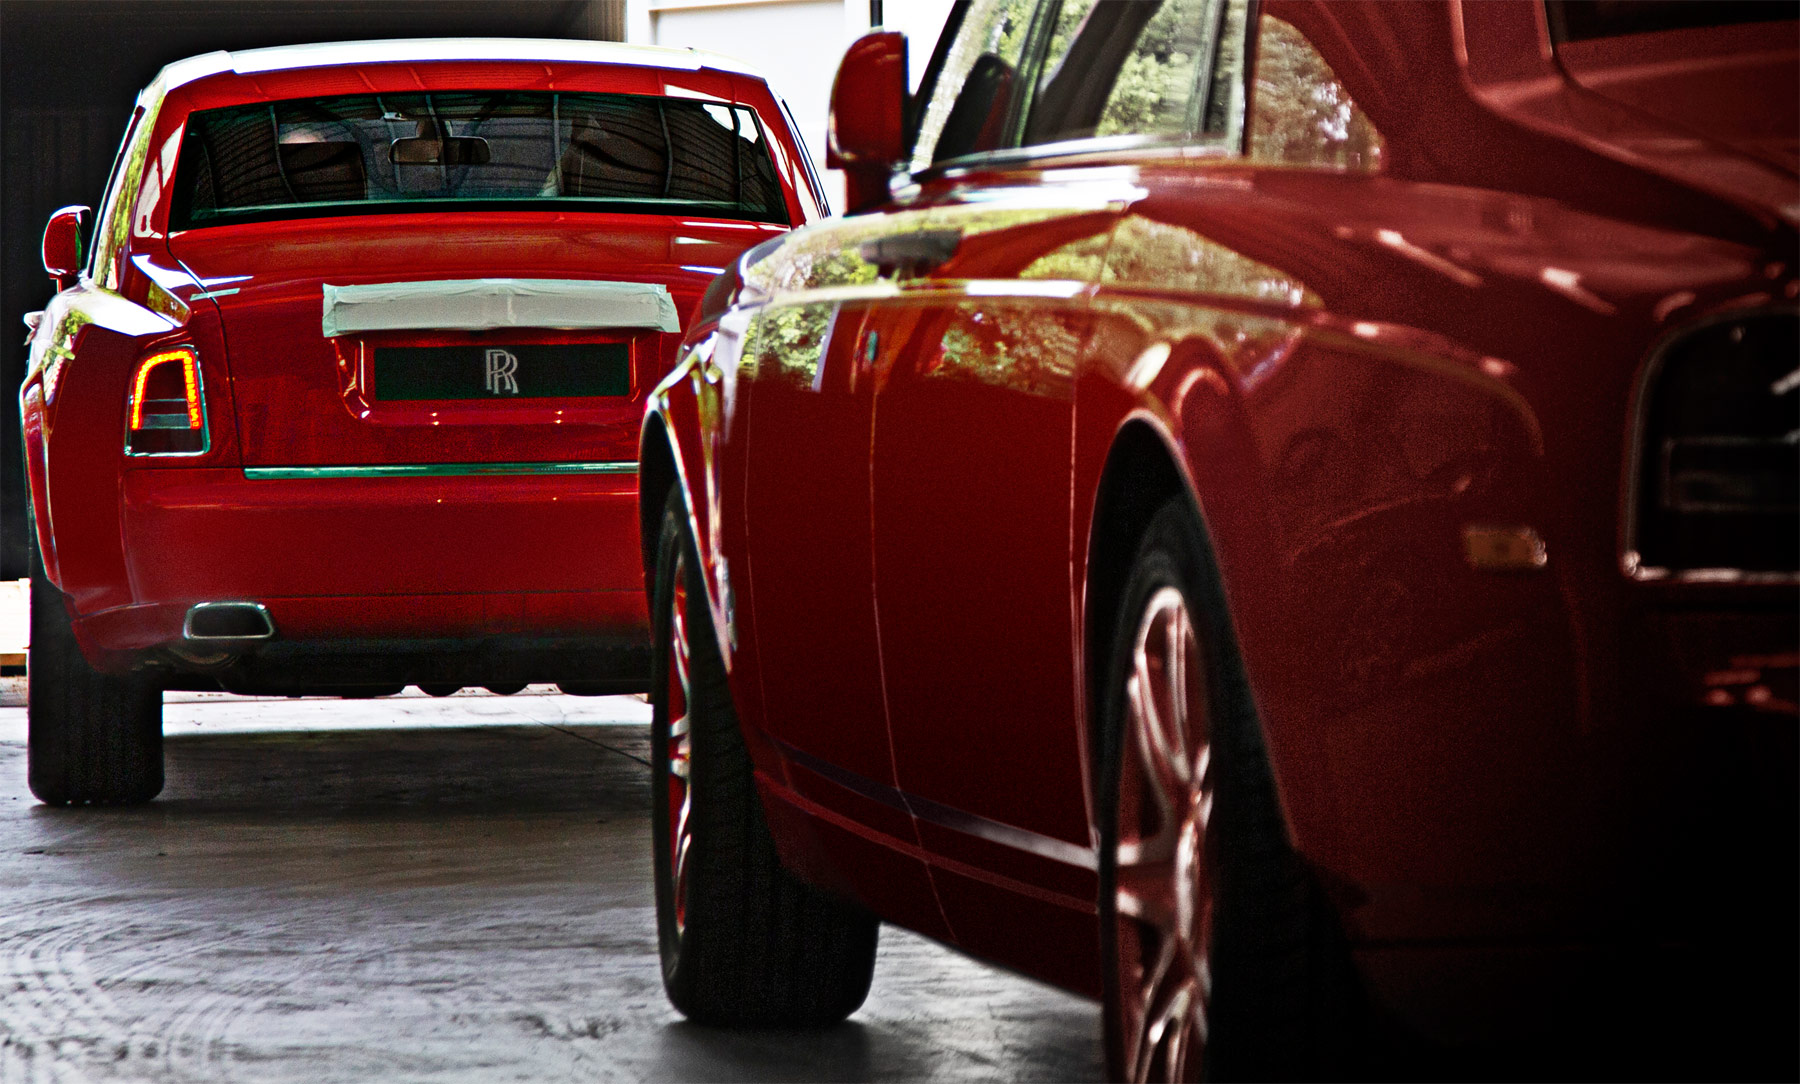 Stephen-Hung-24k-Gold-Rolls-Royce-Phantom-4